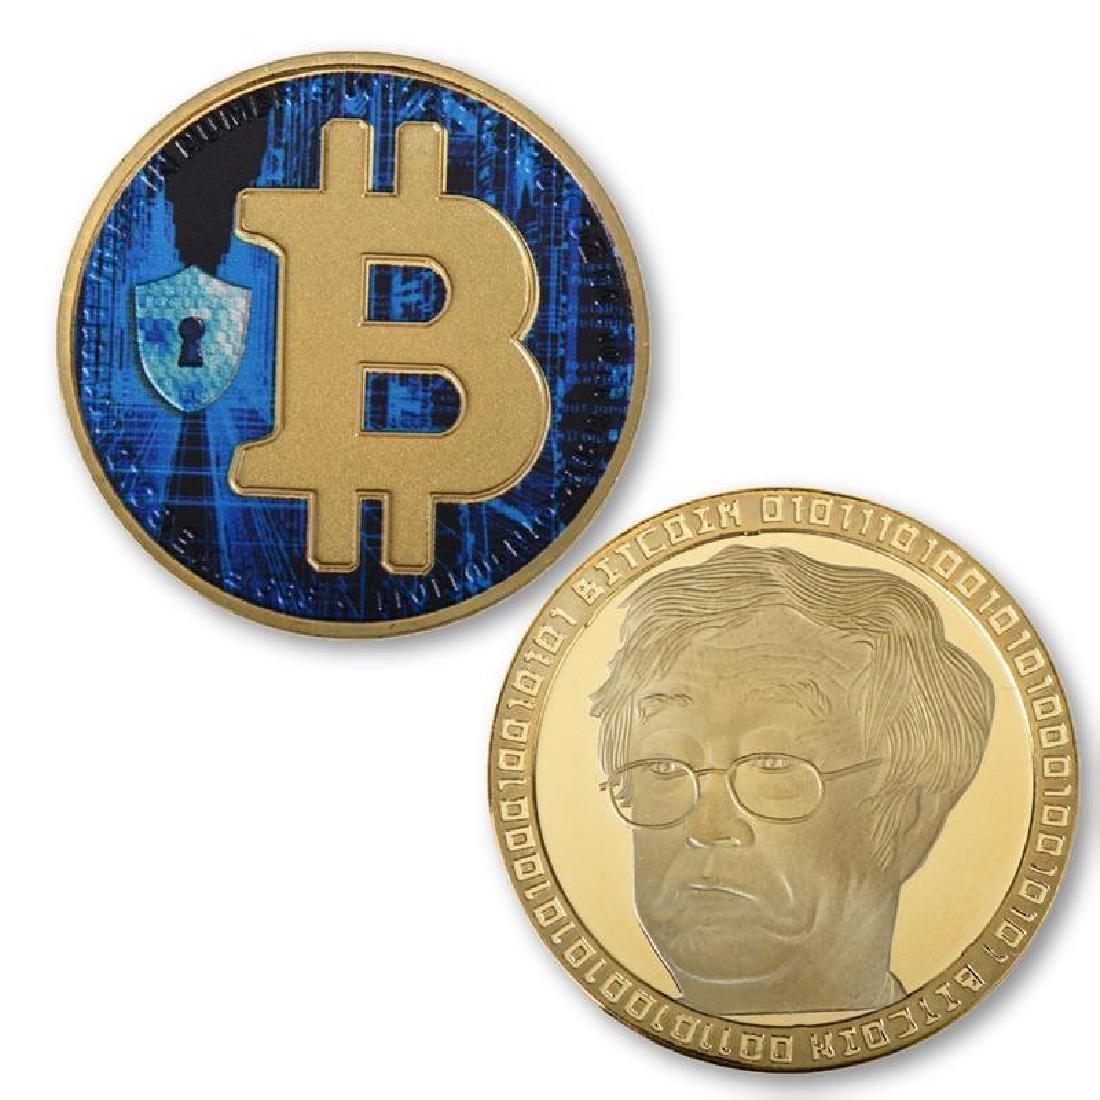 4 Bitcoin Silver and Gold Clad Collectible Coins - 2